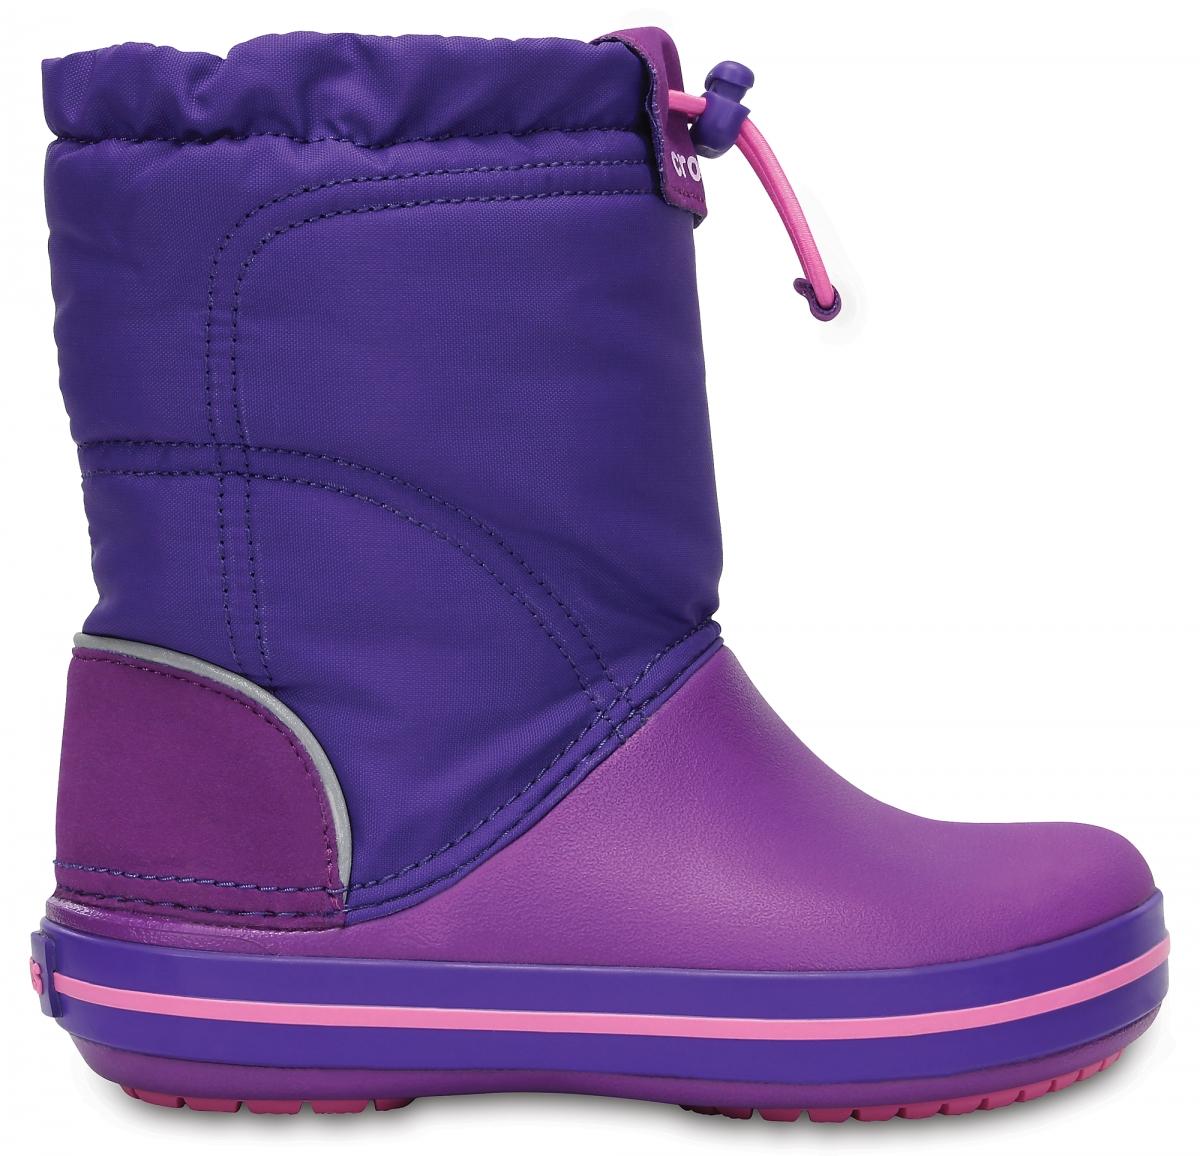 Crocs Crocband LodgePoint Boot Kids - Amethyst/Ultraviolet, C8 (24-25)